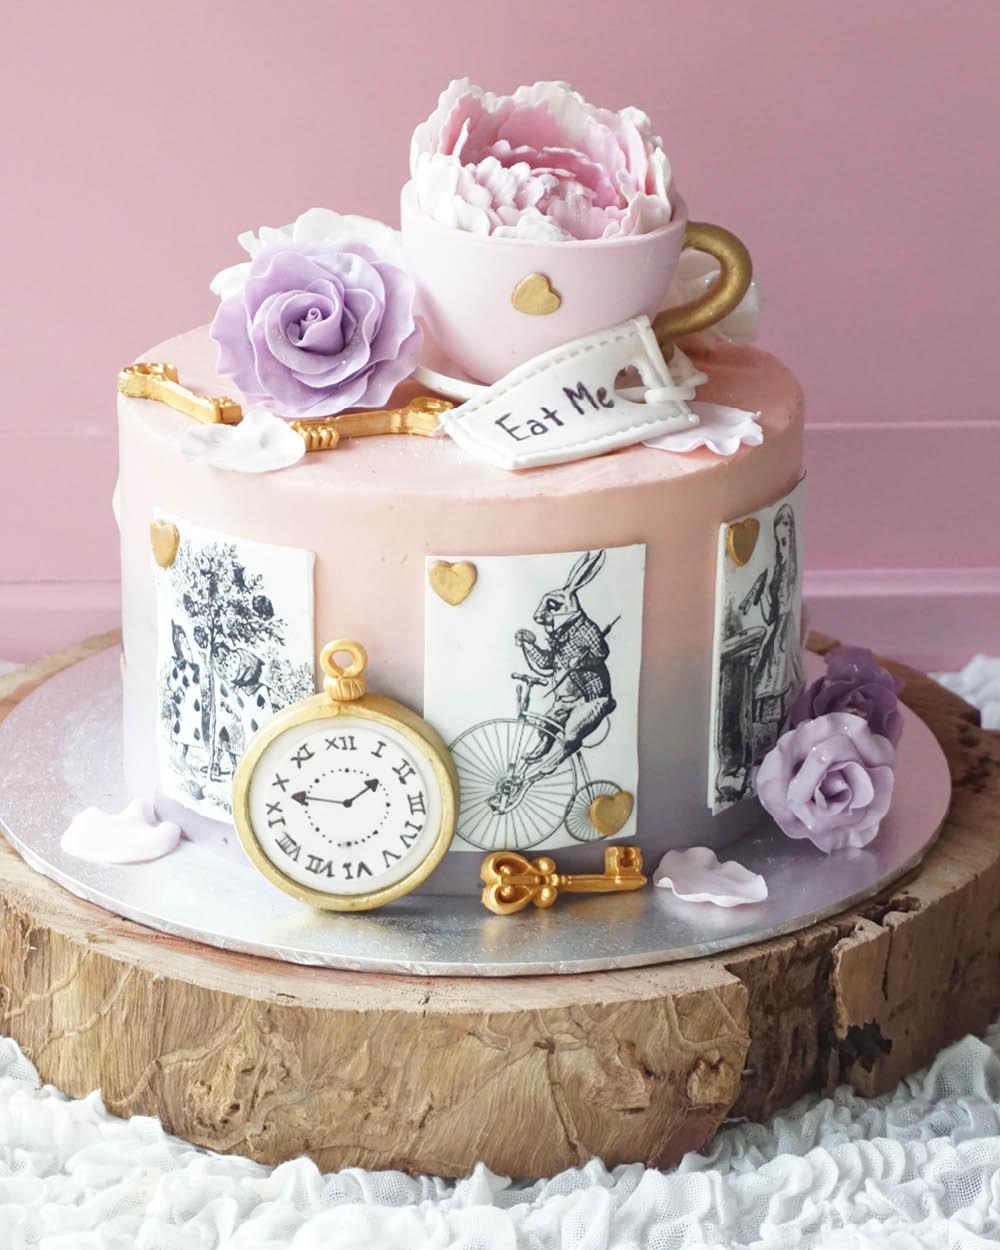 Cakes_By_Aranee_Perth_Drip_Cakes_Custom_Cakes_Wedding_Cakes_Macarons_Cupcakes_Personalised_Cookies_CAKES_Gallery13.jpg